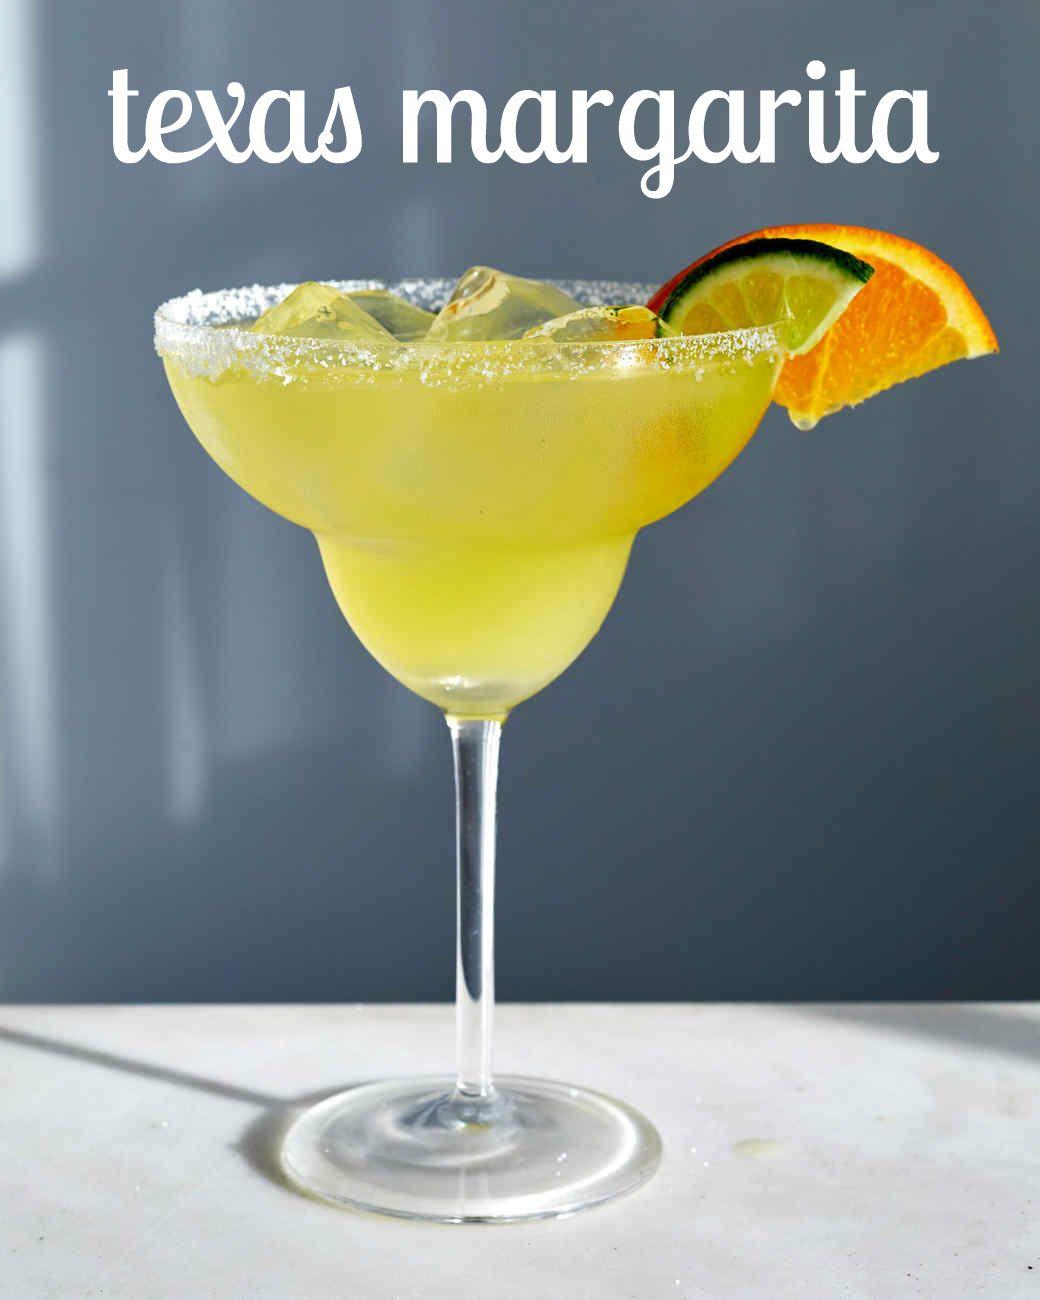 Margarita, Margarita Cocktail